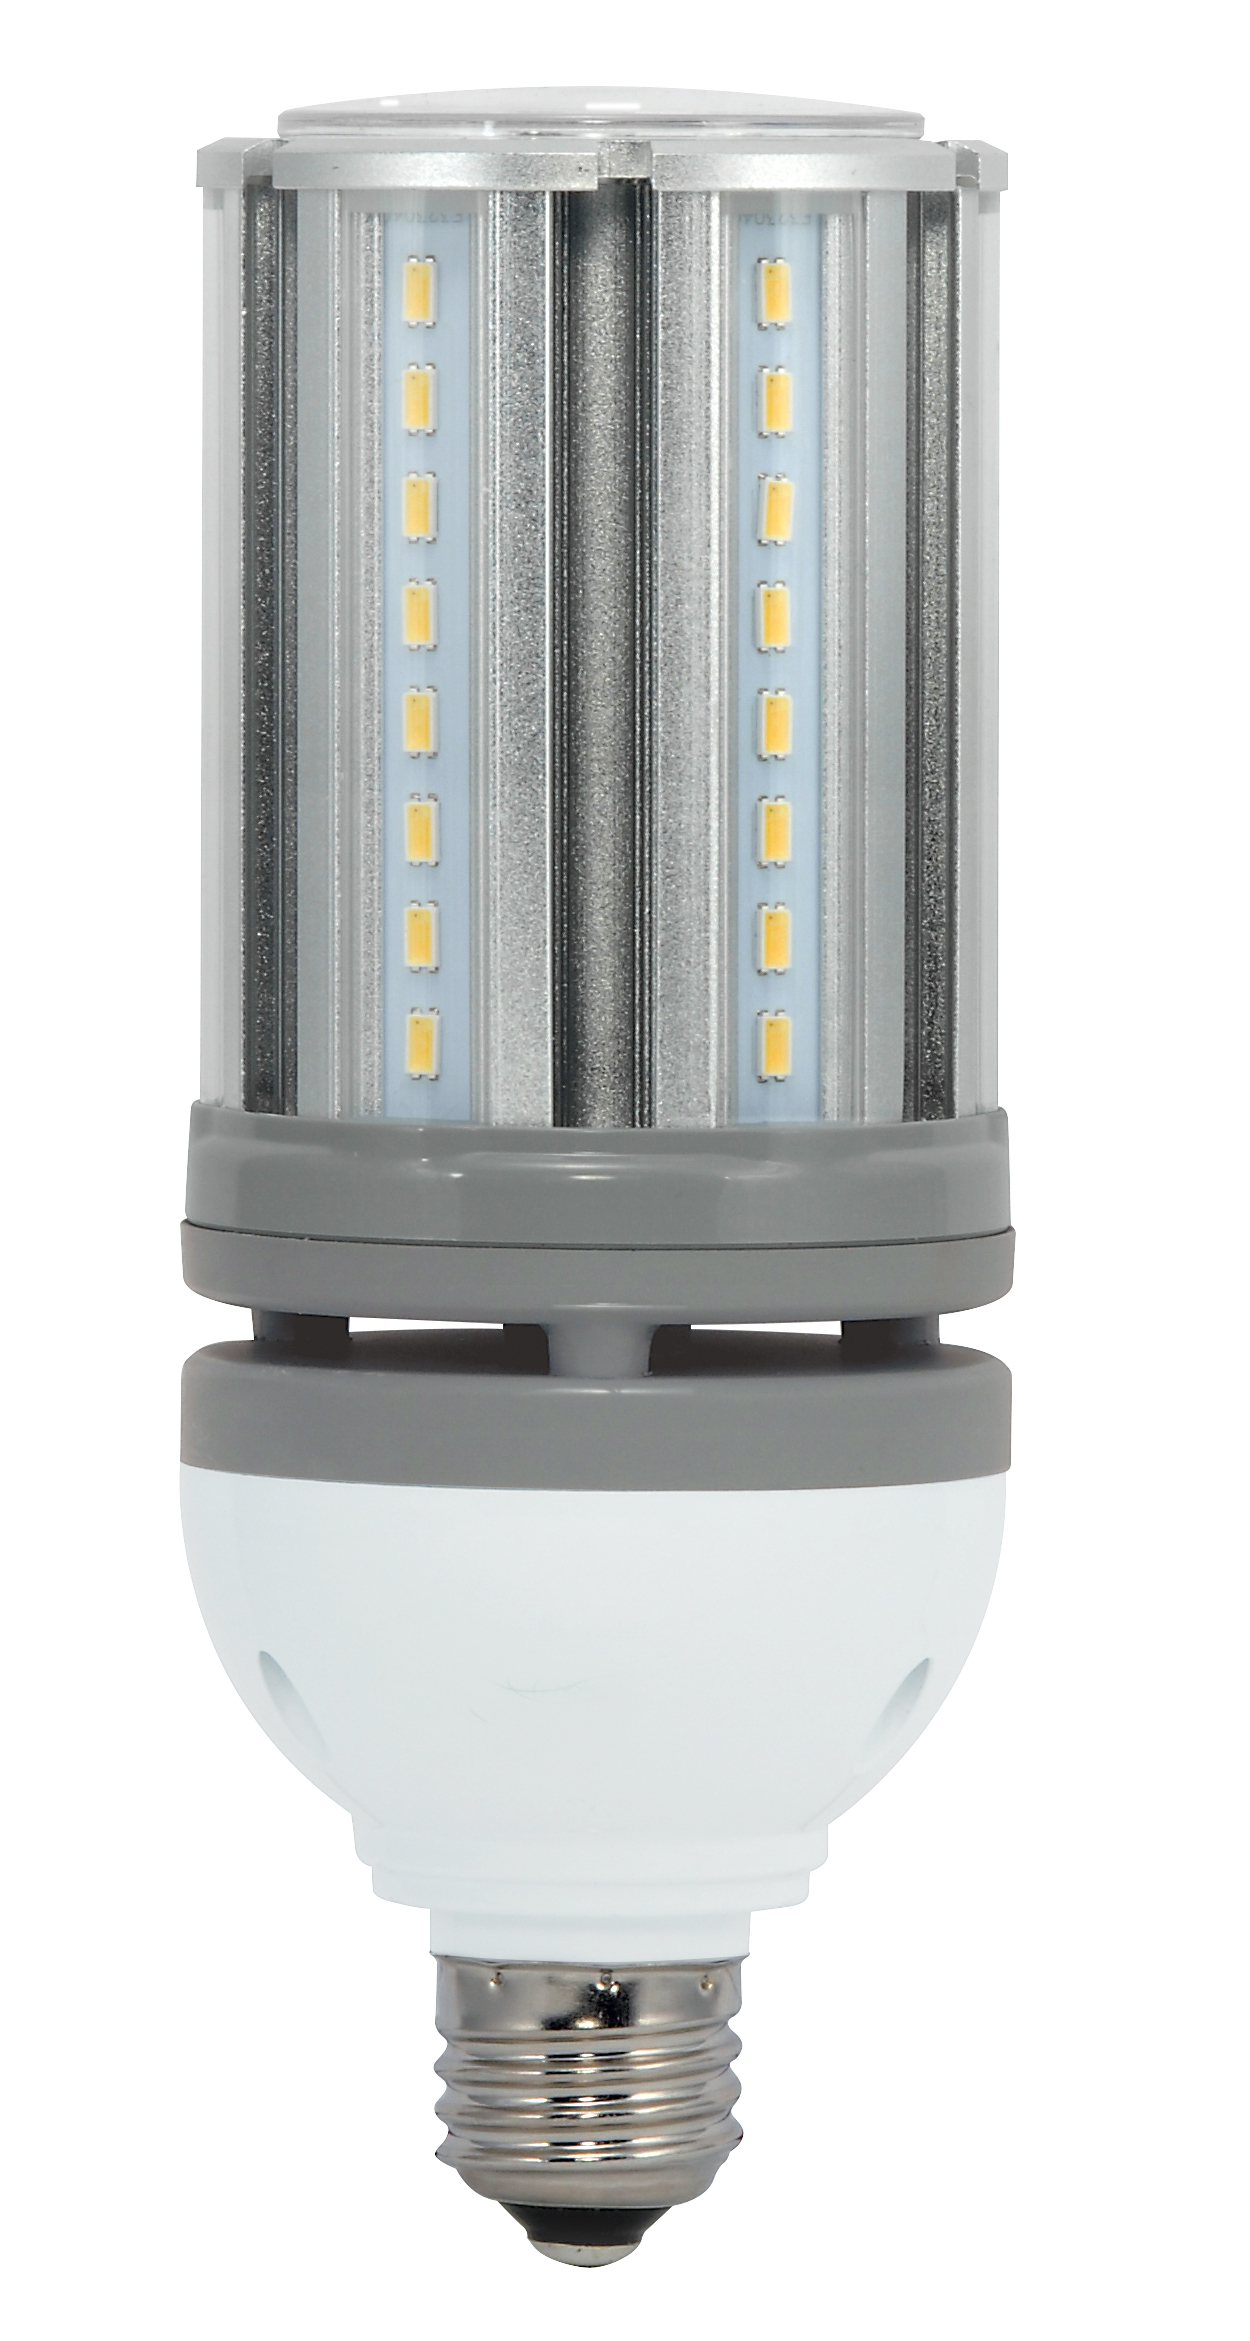 Satco,S9390,SATCO® Hi-Pro Non-Dimmable LED Retrofit, LED Lamp, 100 to 277 VAC